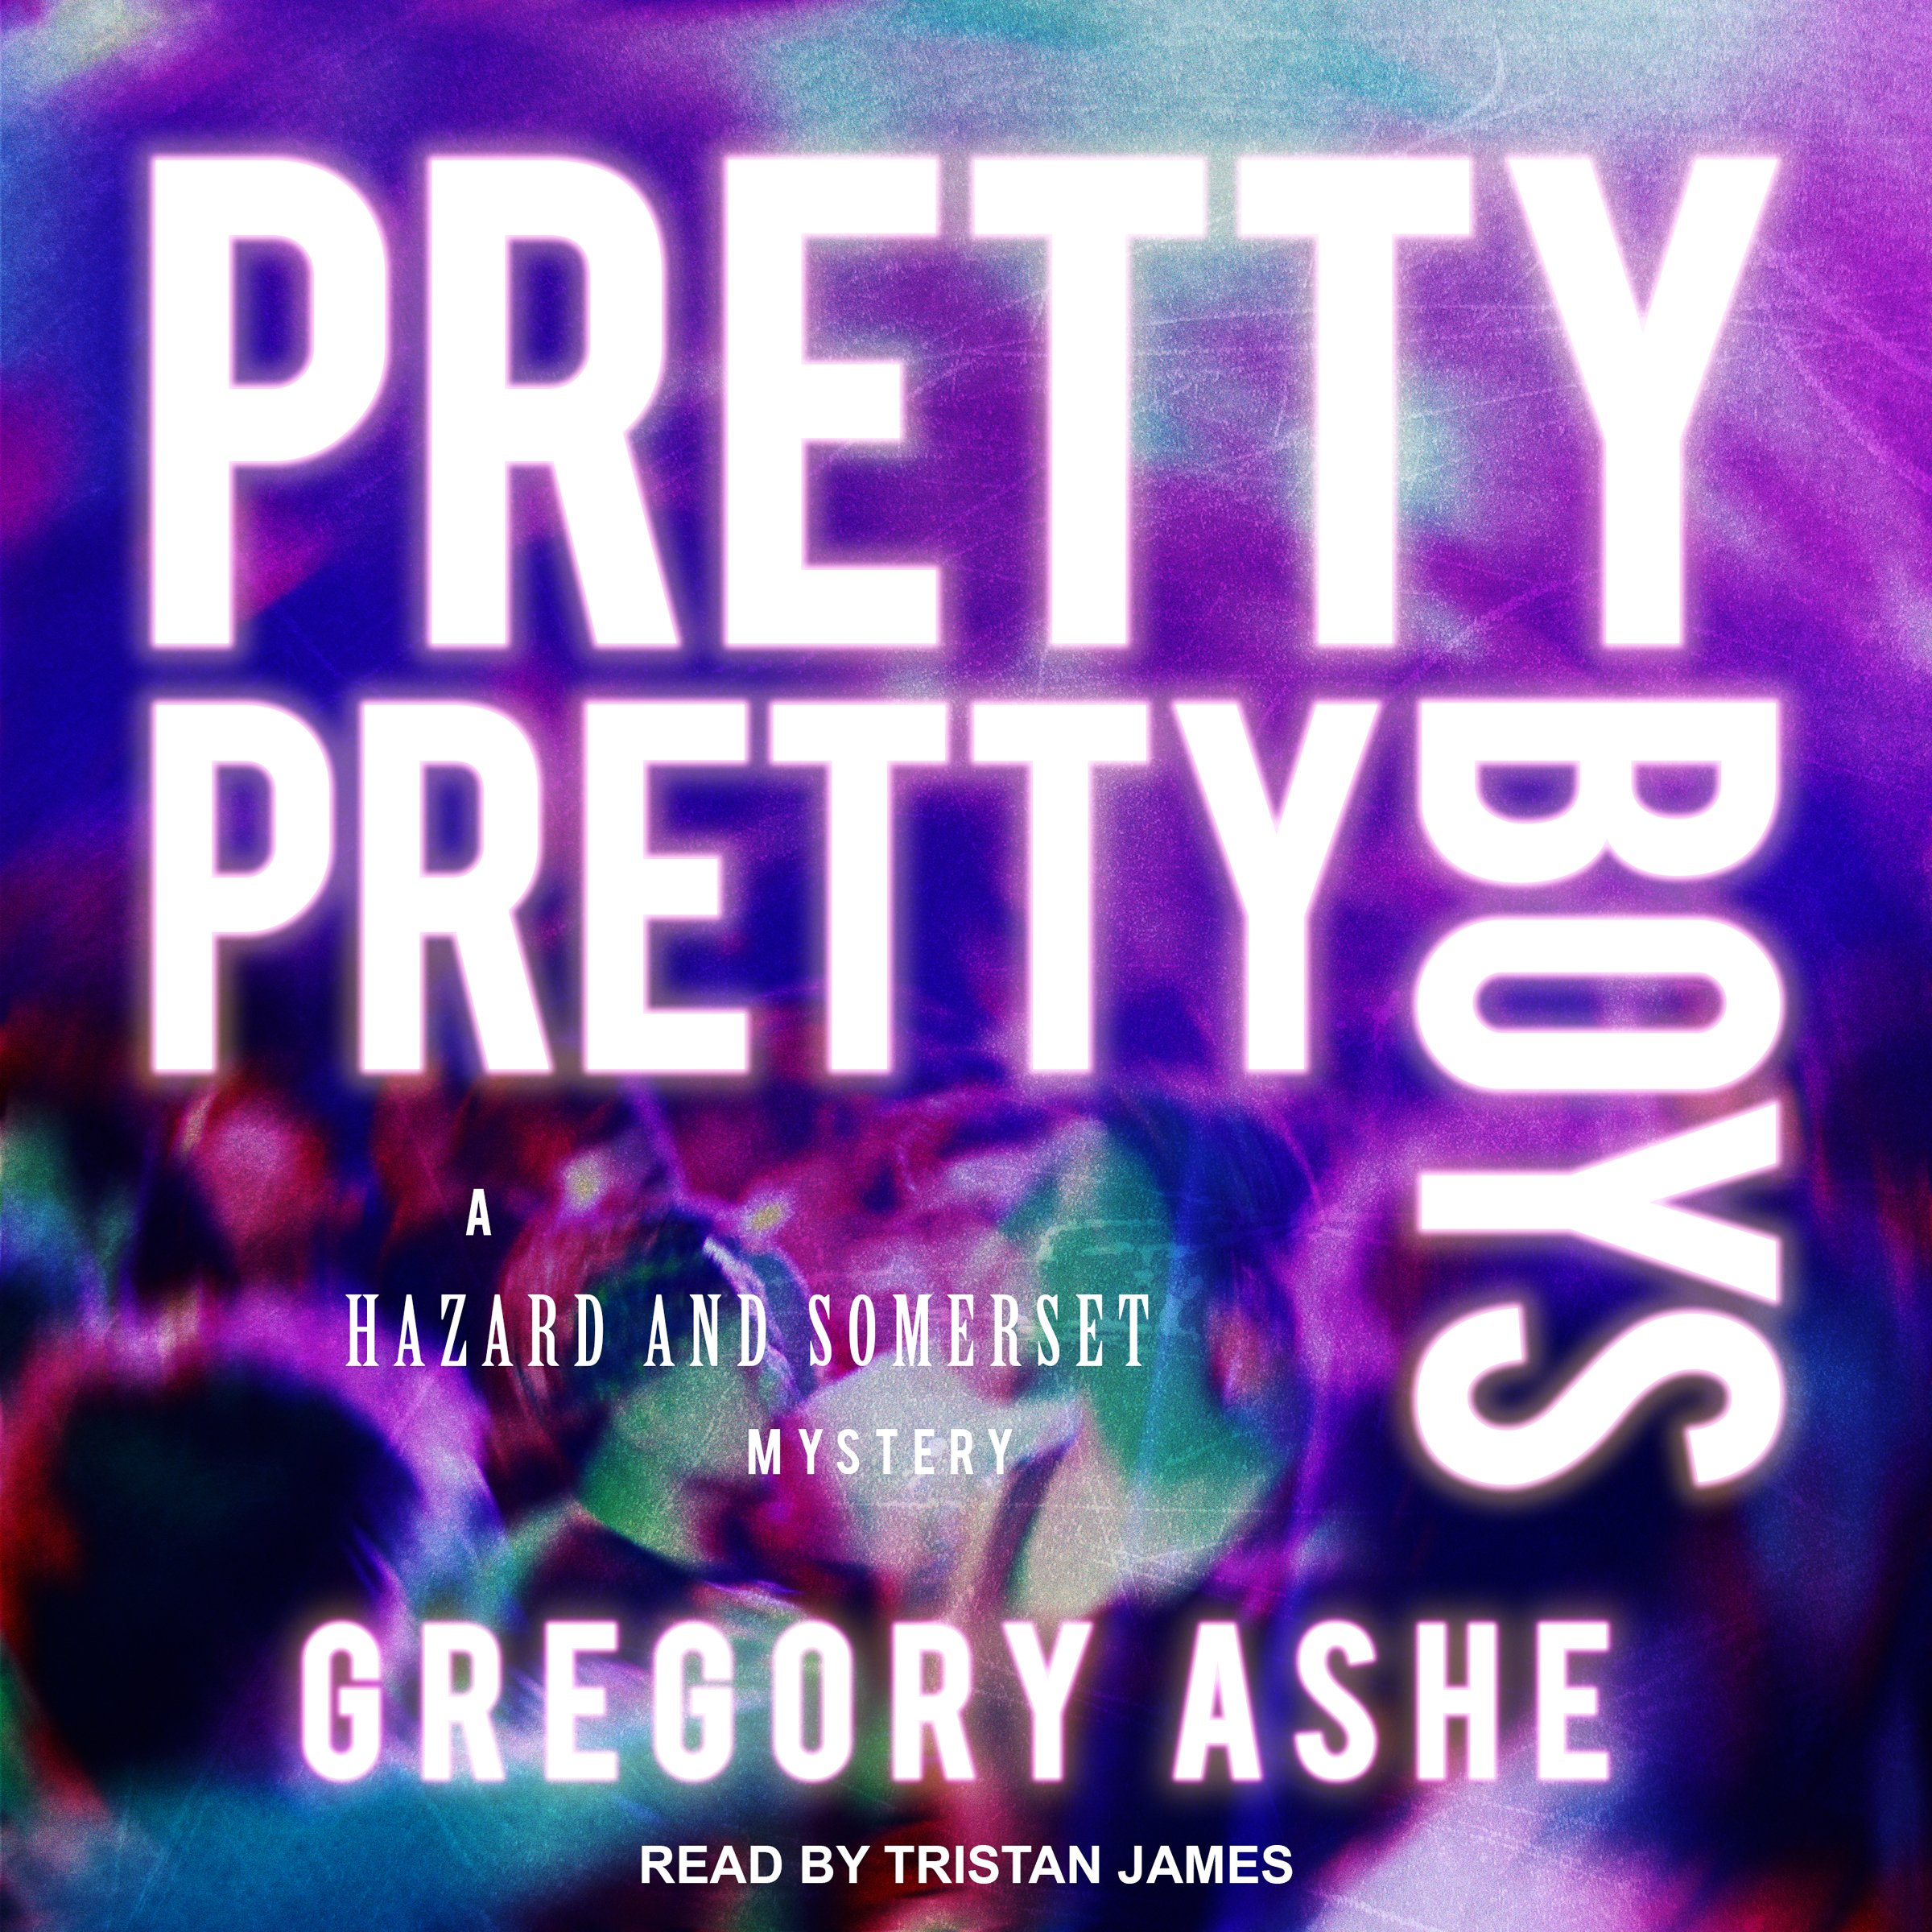 Pretty Pretty Boys: Hazard and Somerset Mystery Series, Book 1